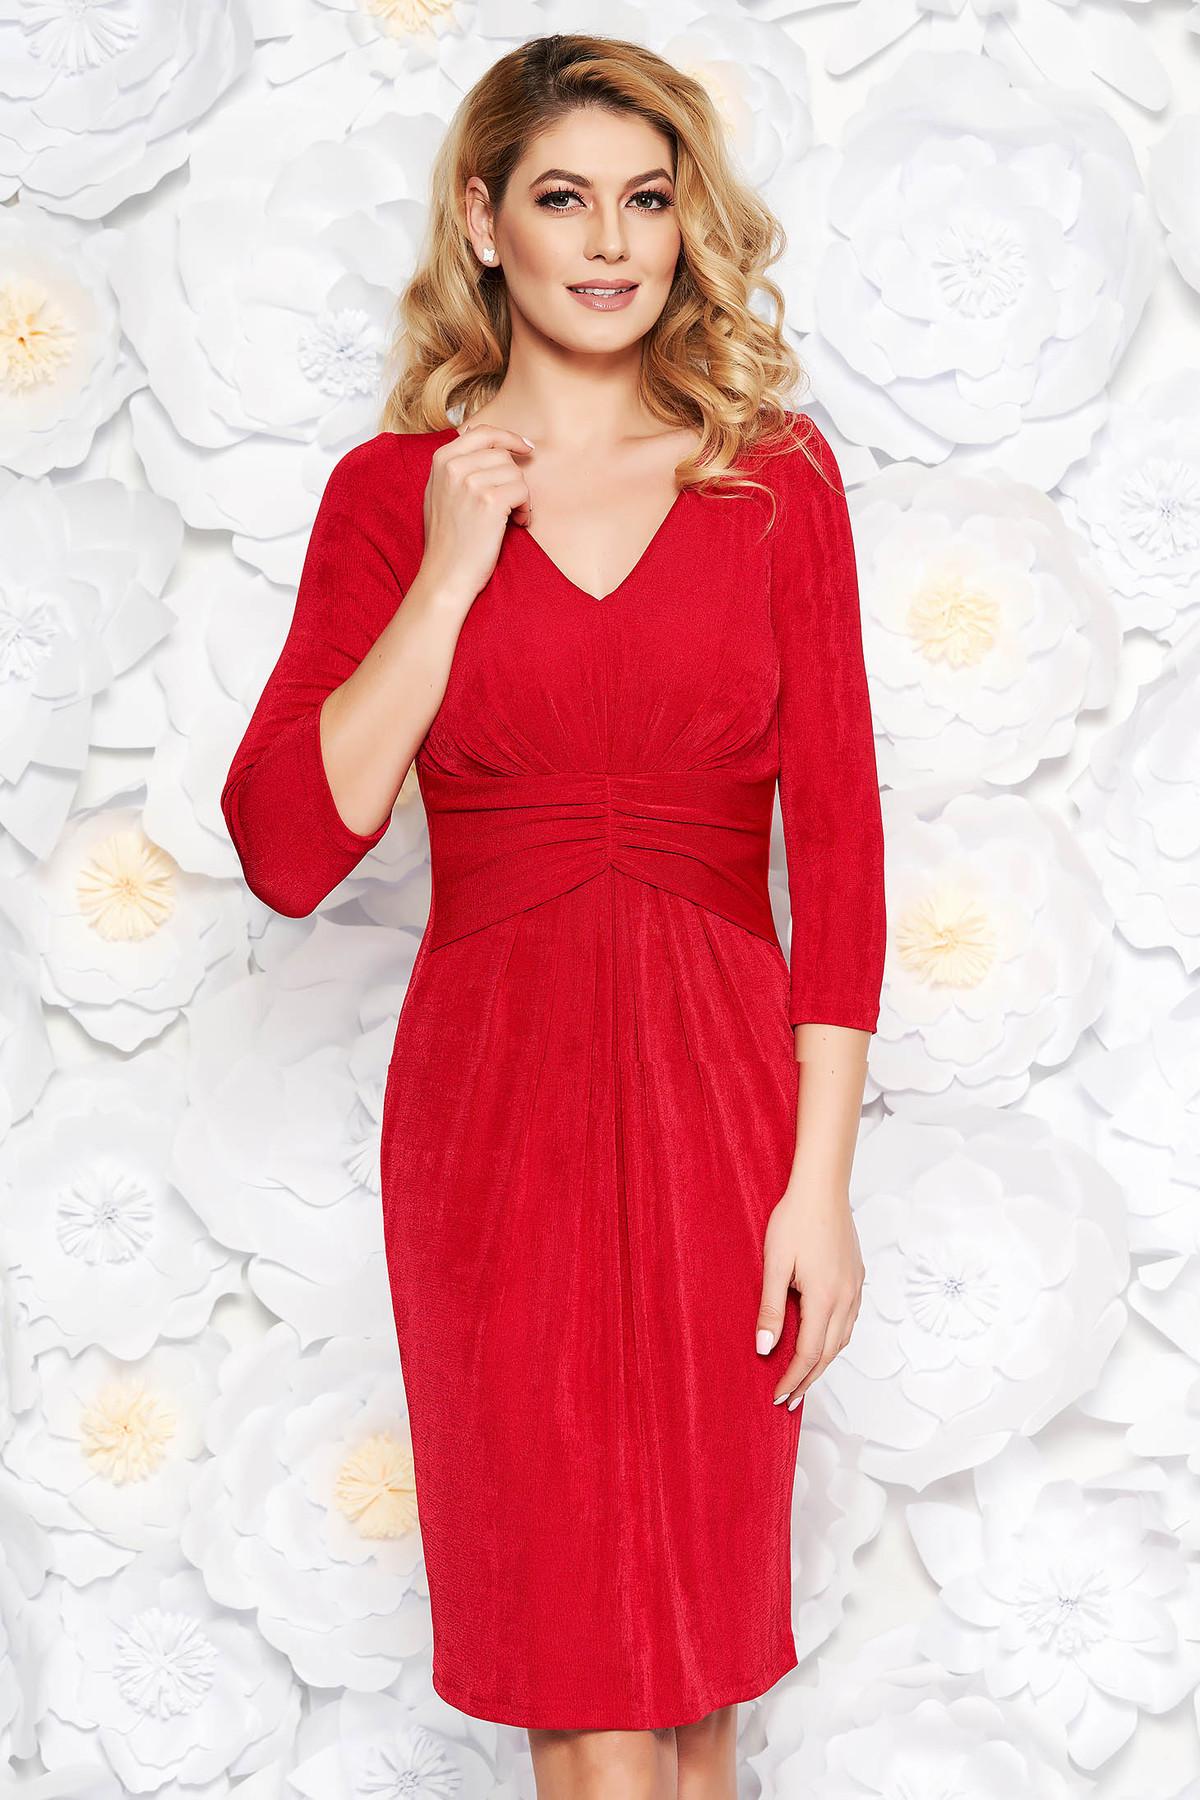 Rochie rosie de ocazie midi din material lucios captusita pe interior cu decolteu in v